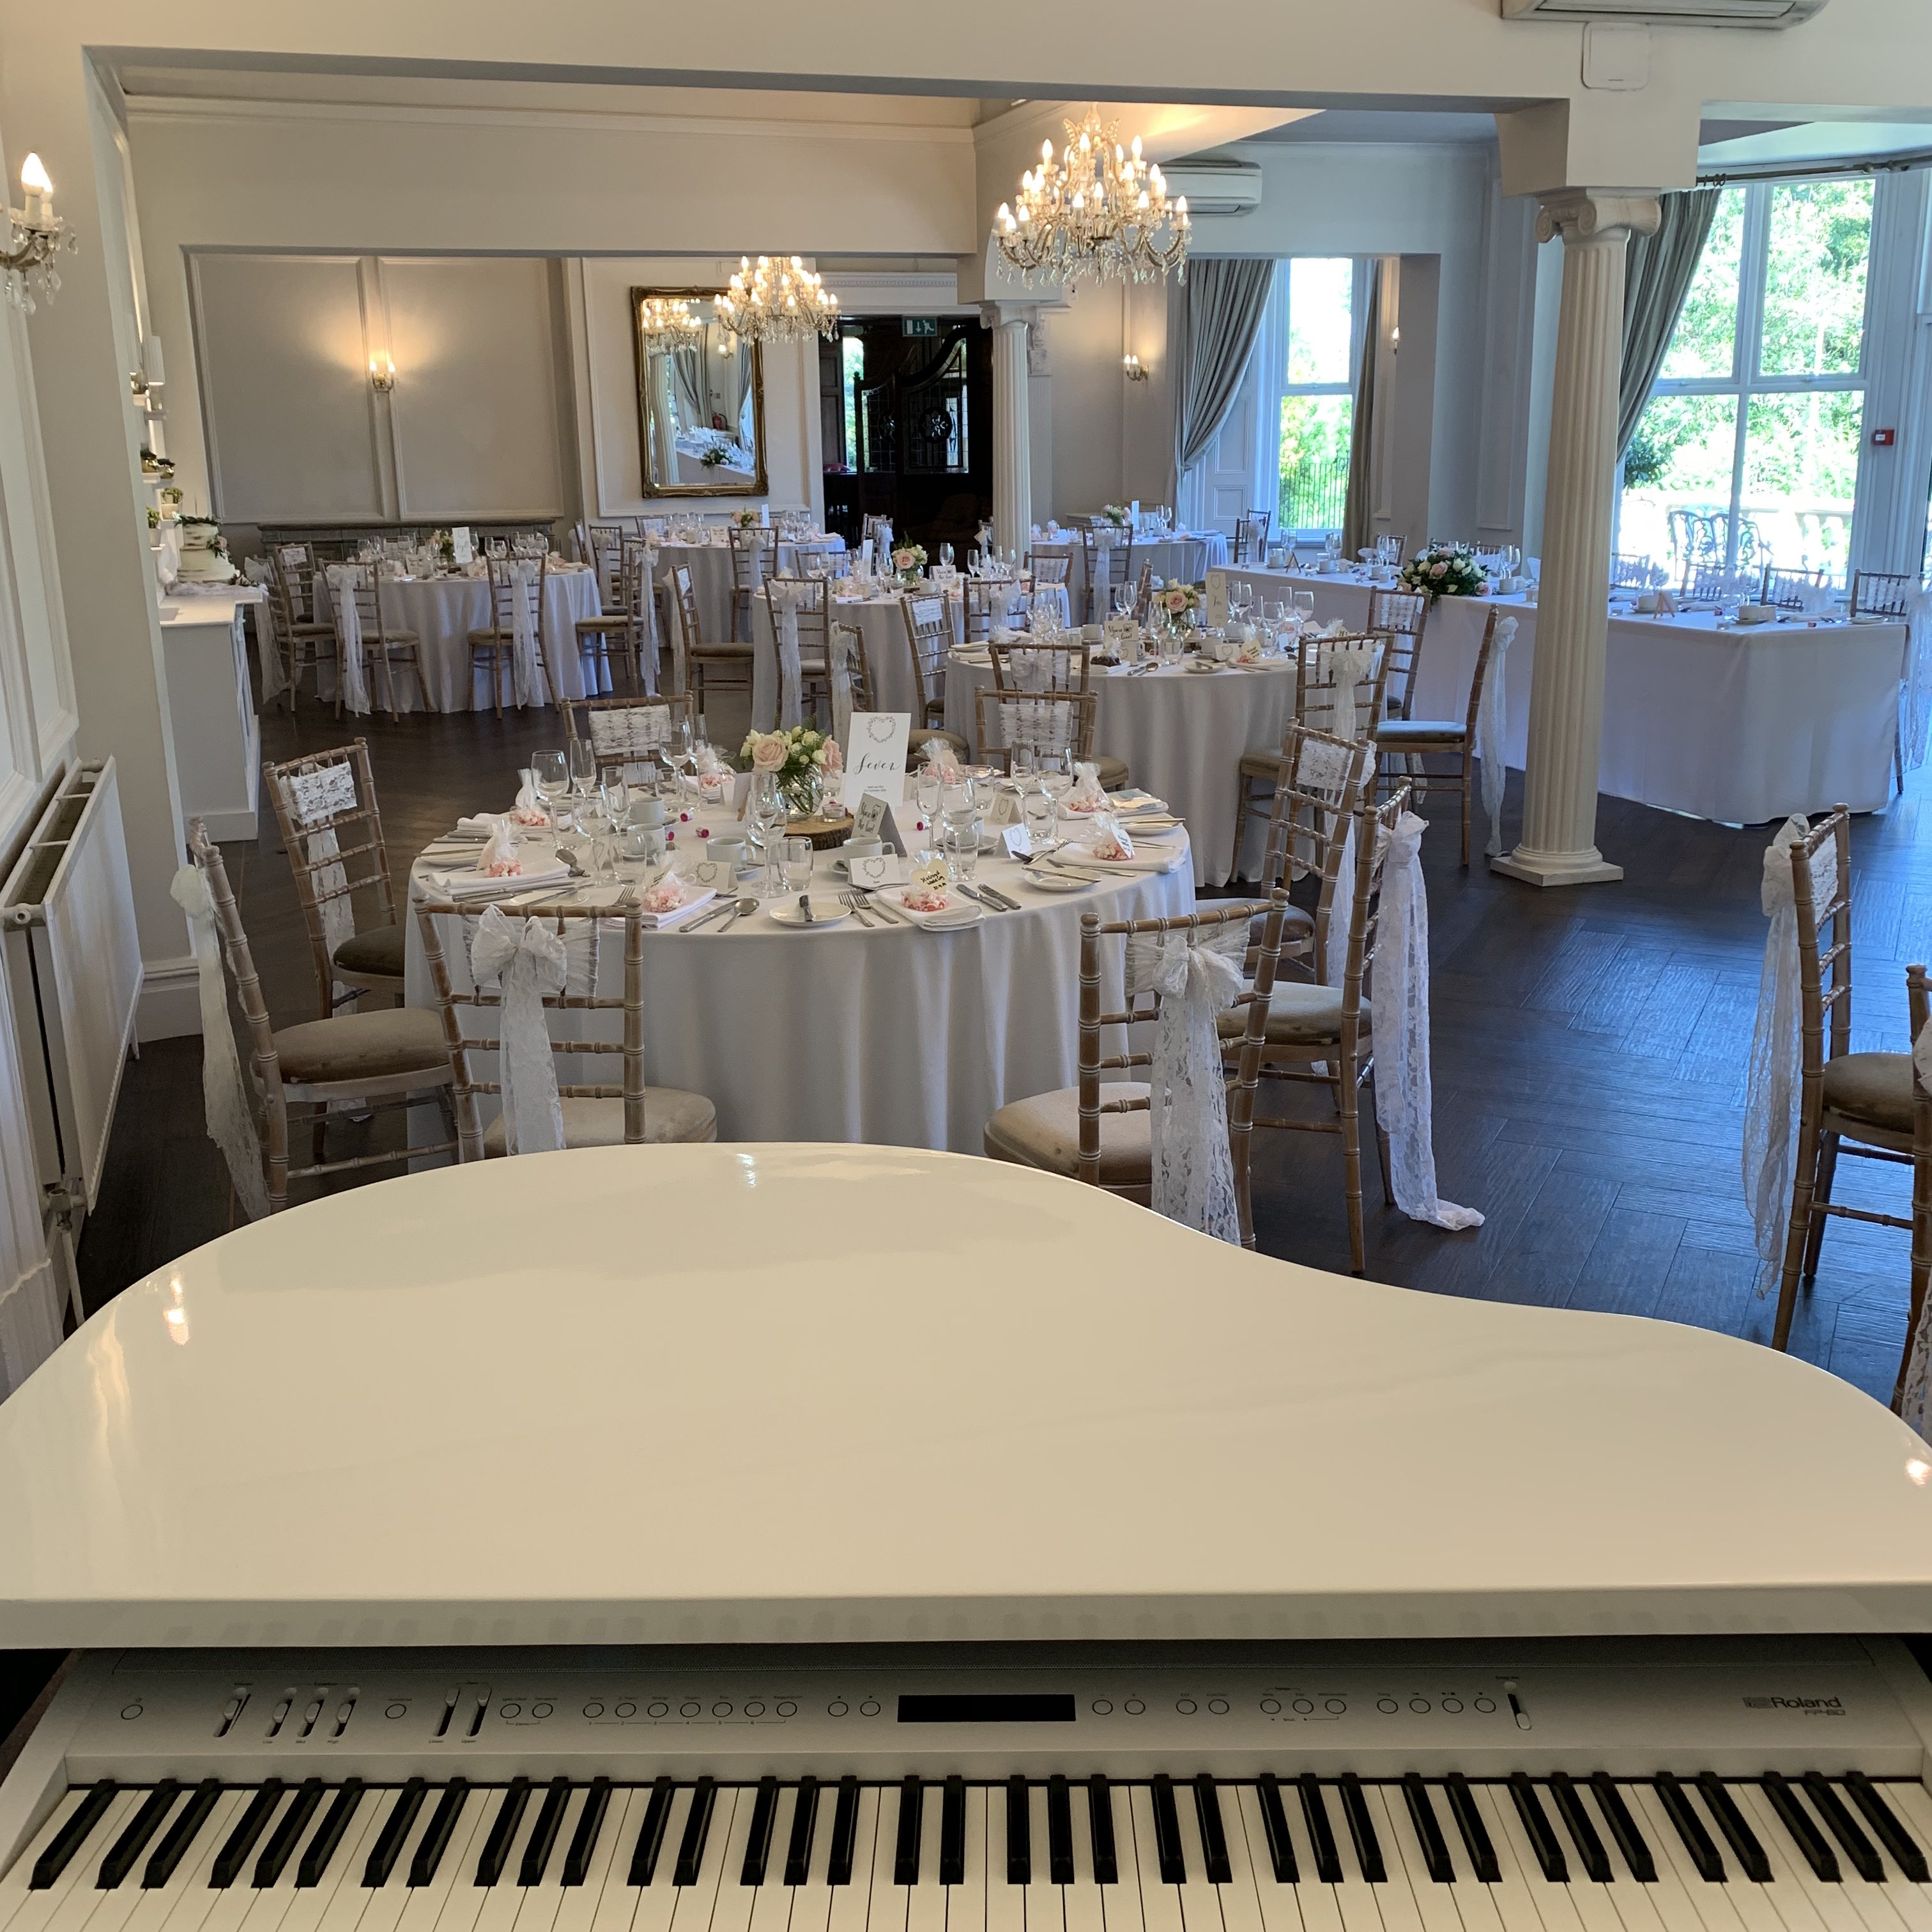 Ashfield House wedding pianist Craig Smith's set up for a wedding breakfast